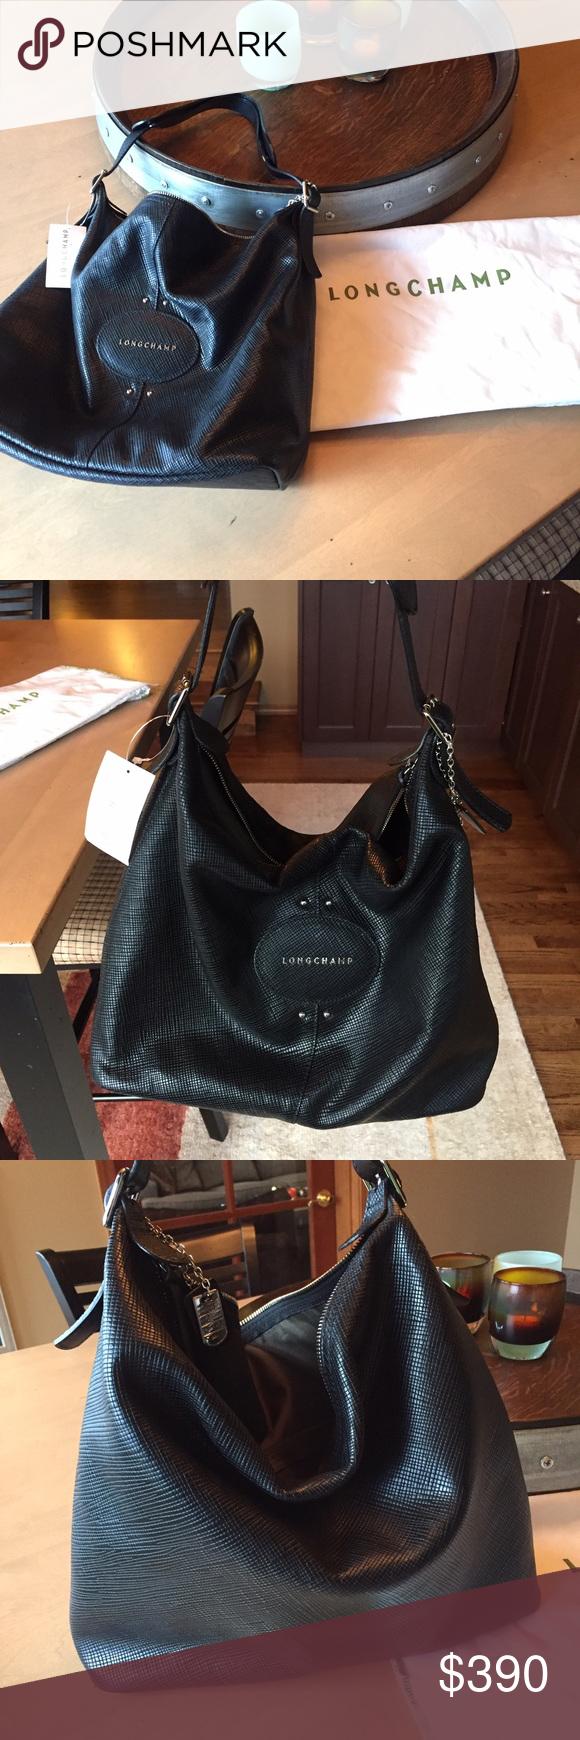 Gorgeous Longchamp Black Quadri Hobo Bag Nwt Flat Style Quadry Brand New Never Been Used Purse Color